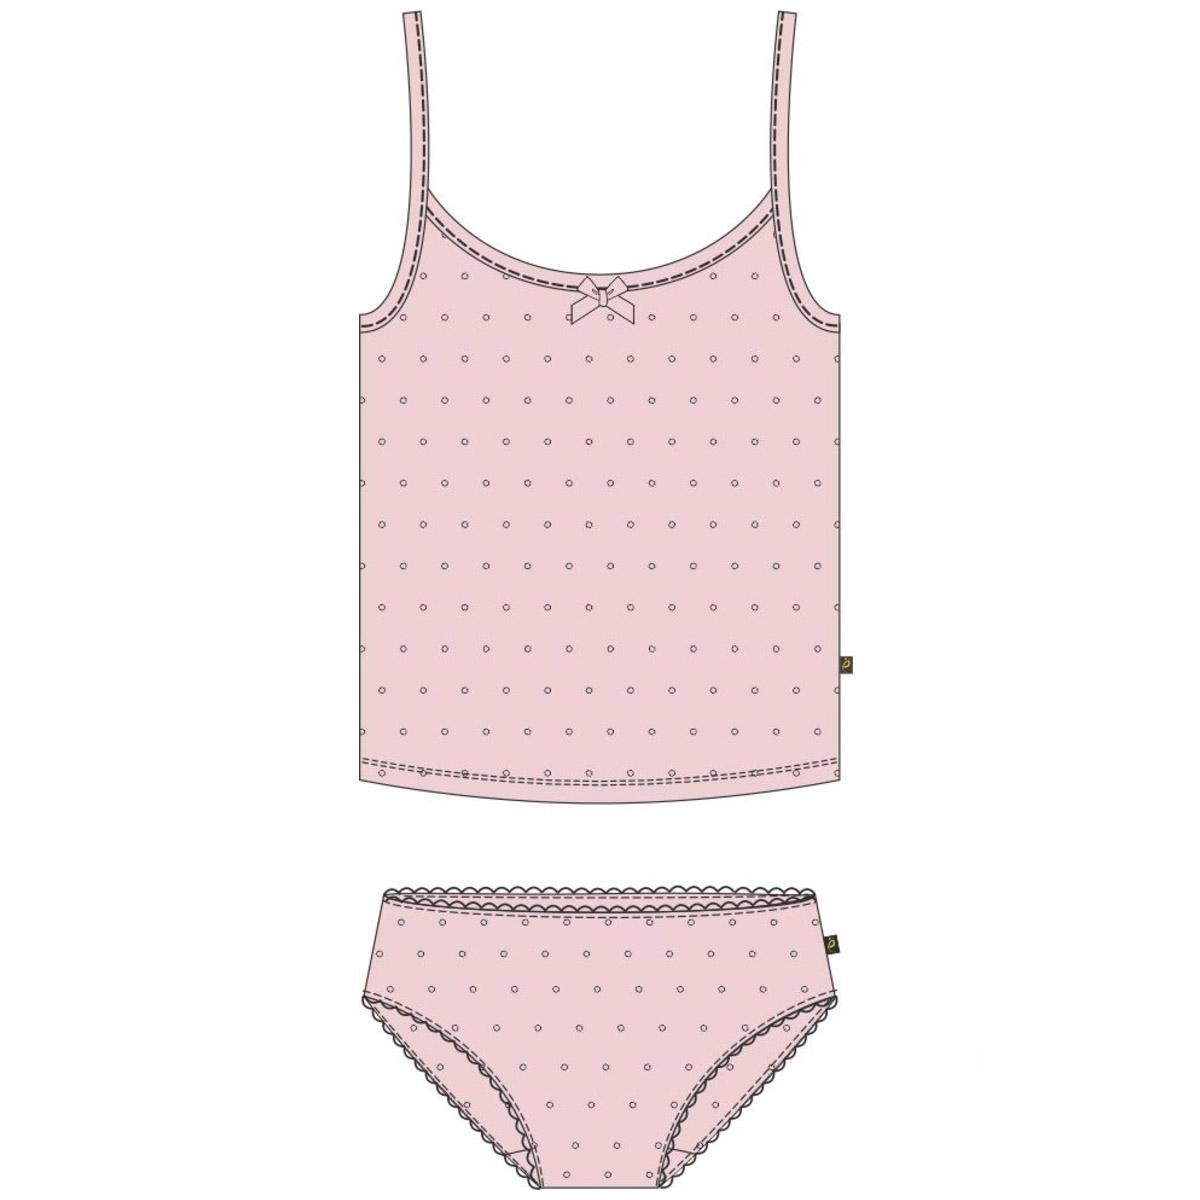 Комплект Ёмаё майка и трусы (33-101) рост 86 розовый<br>